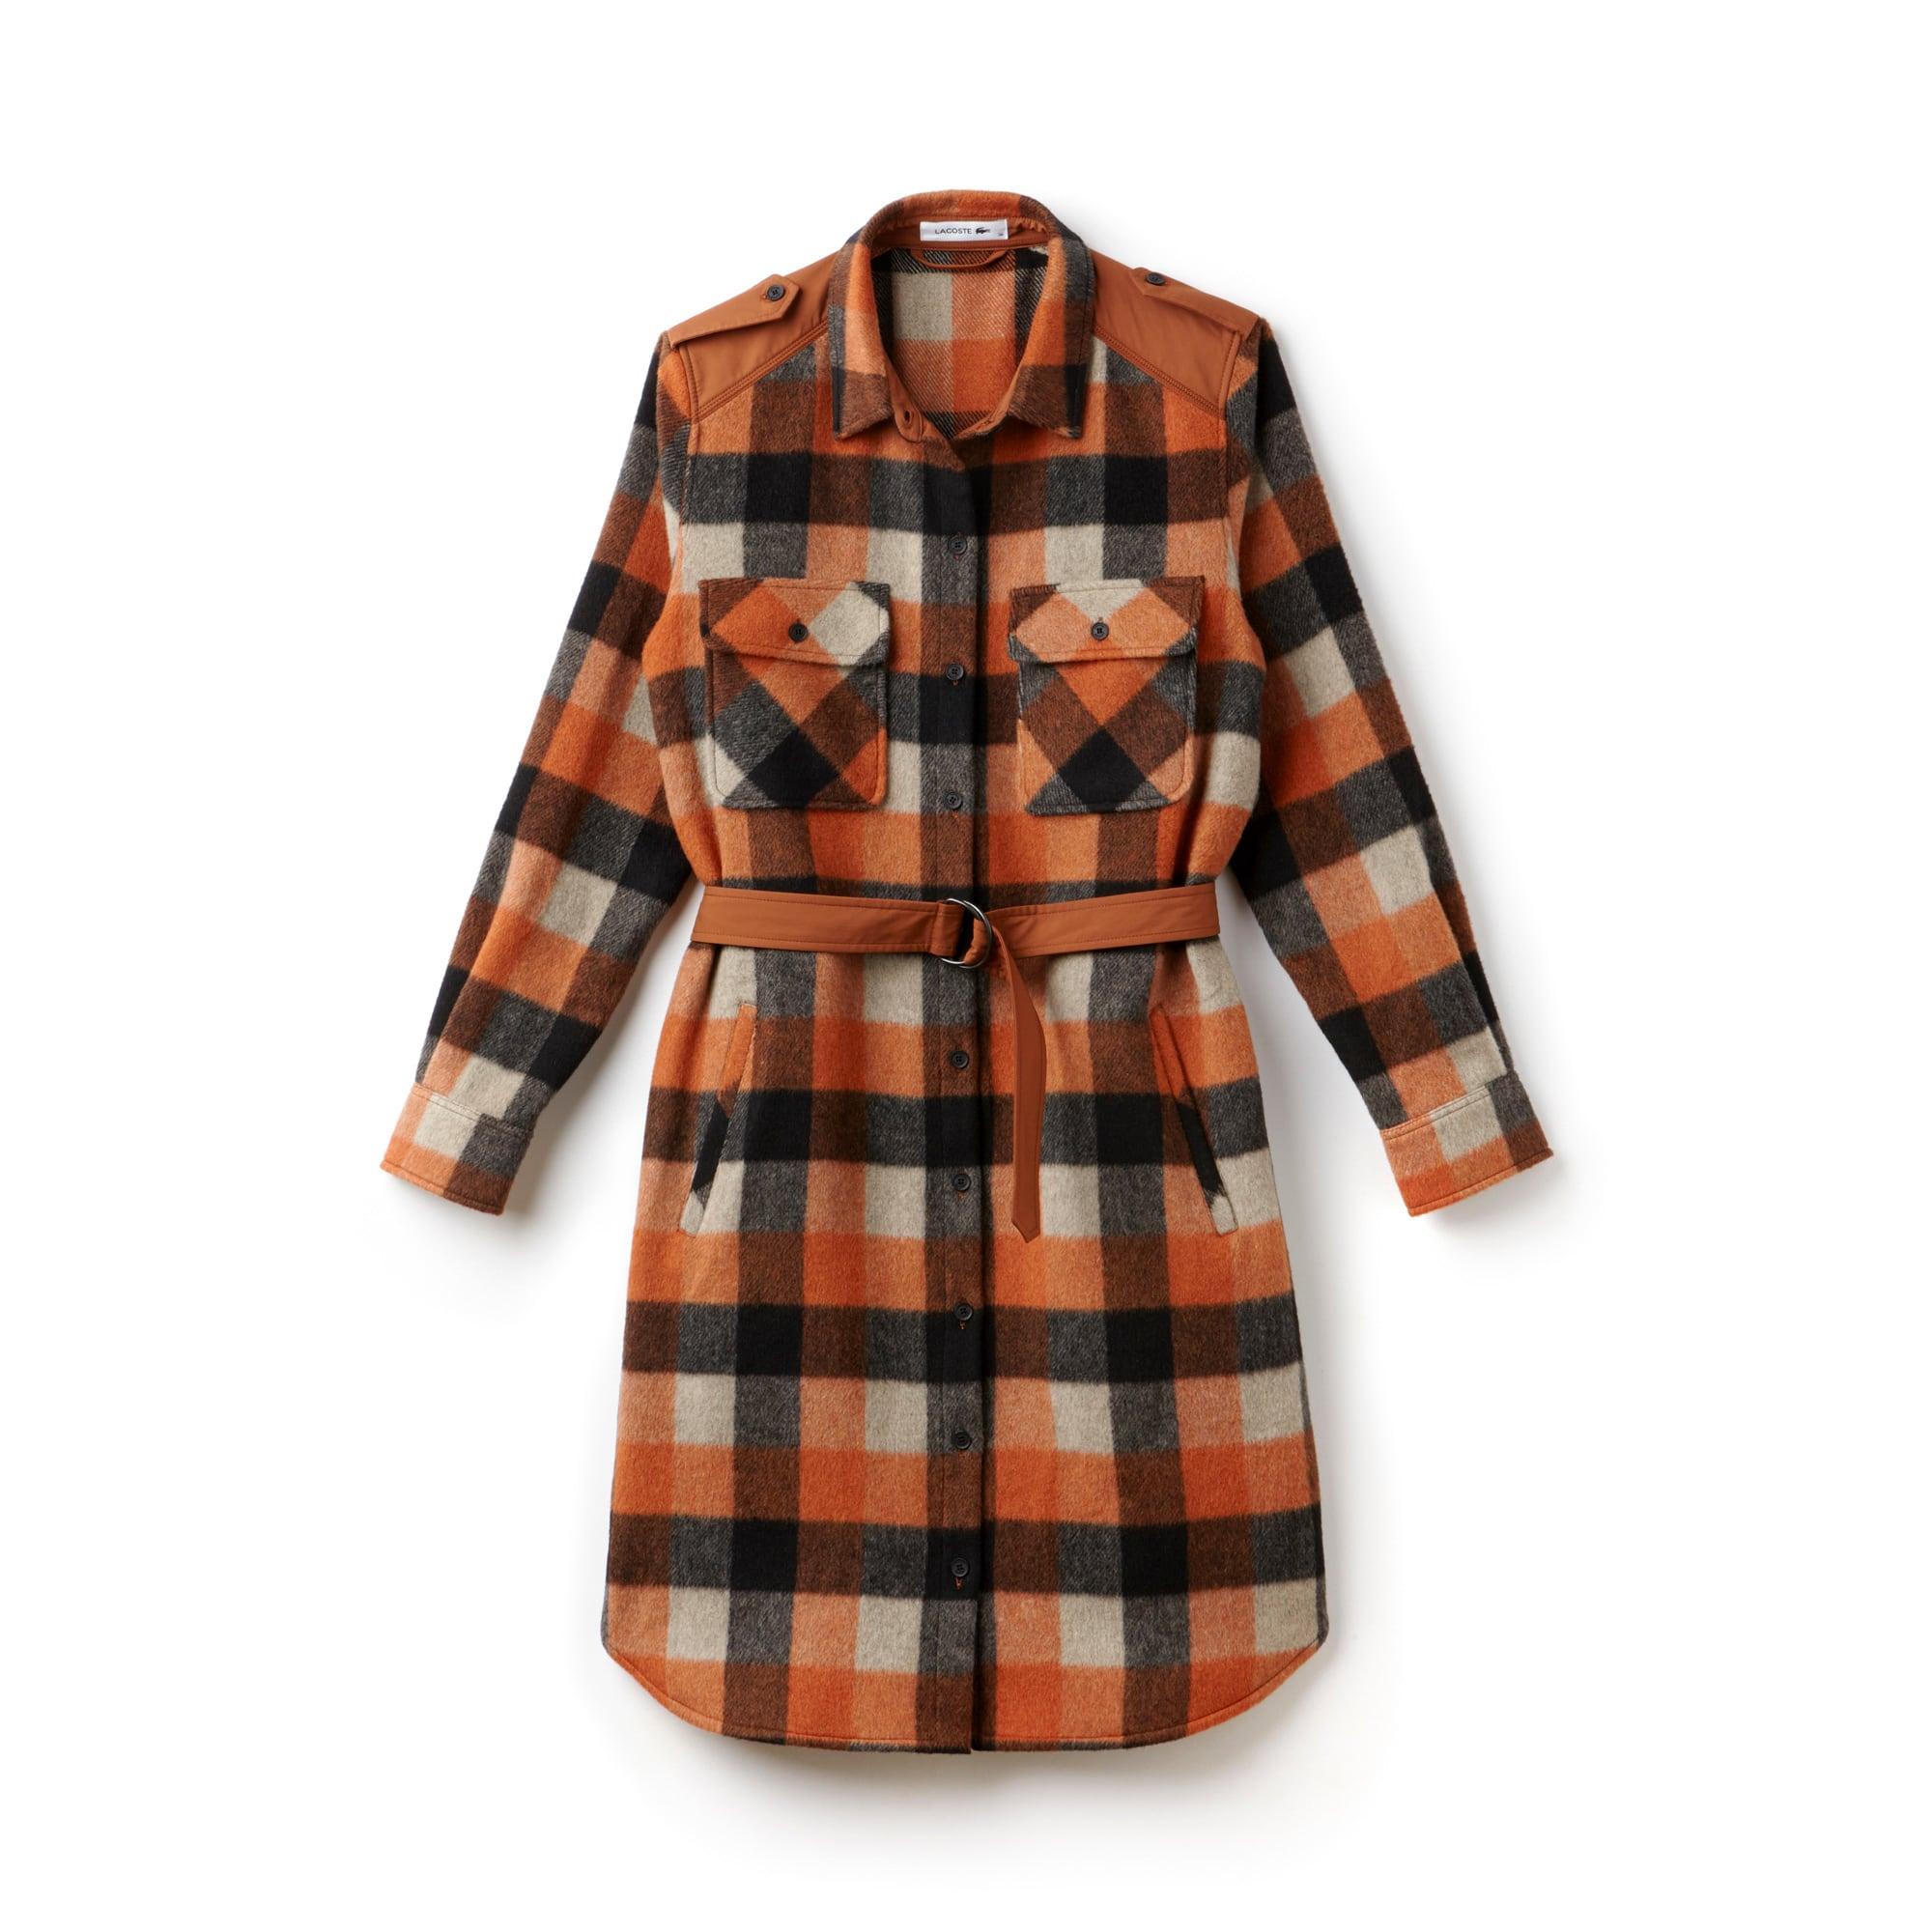 Women's Fashion Show Wool Flannel Check Shirt Dress